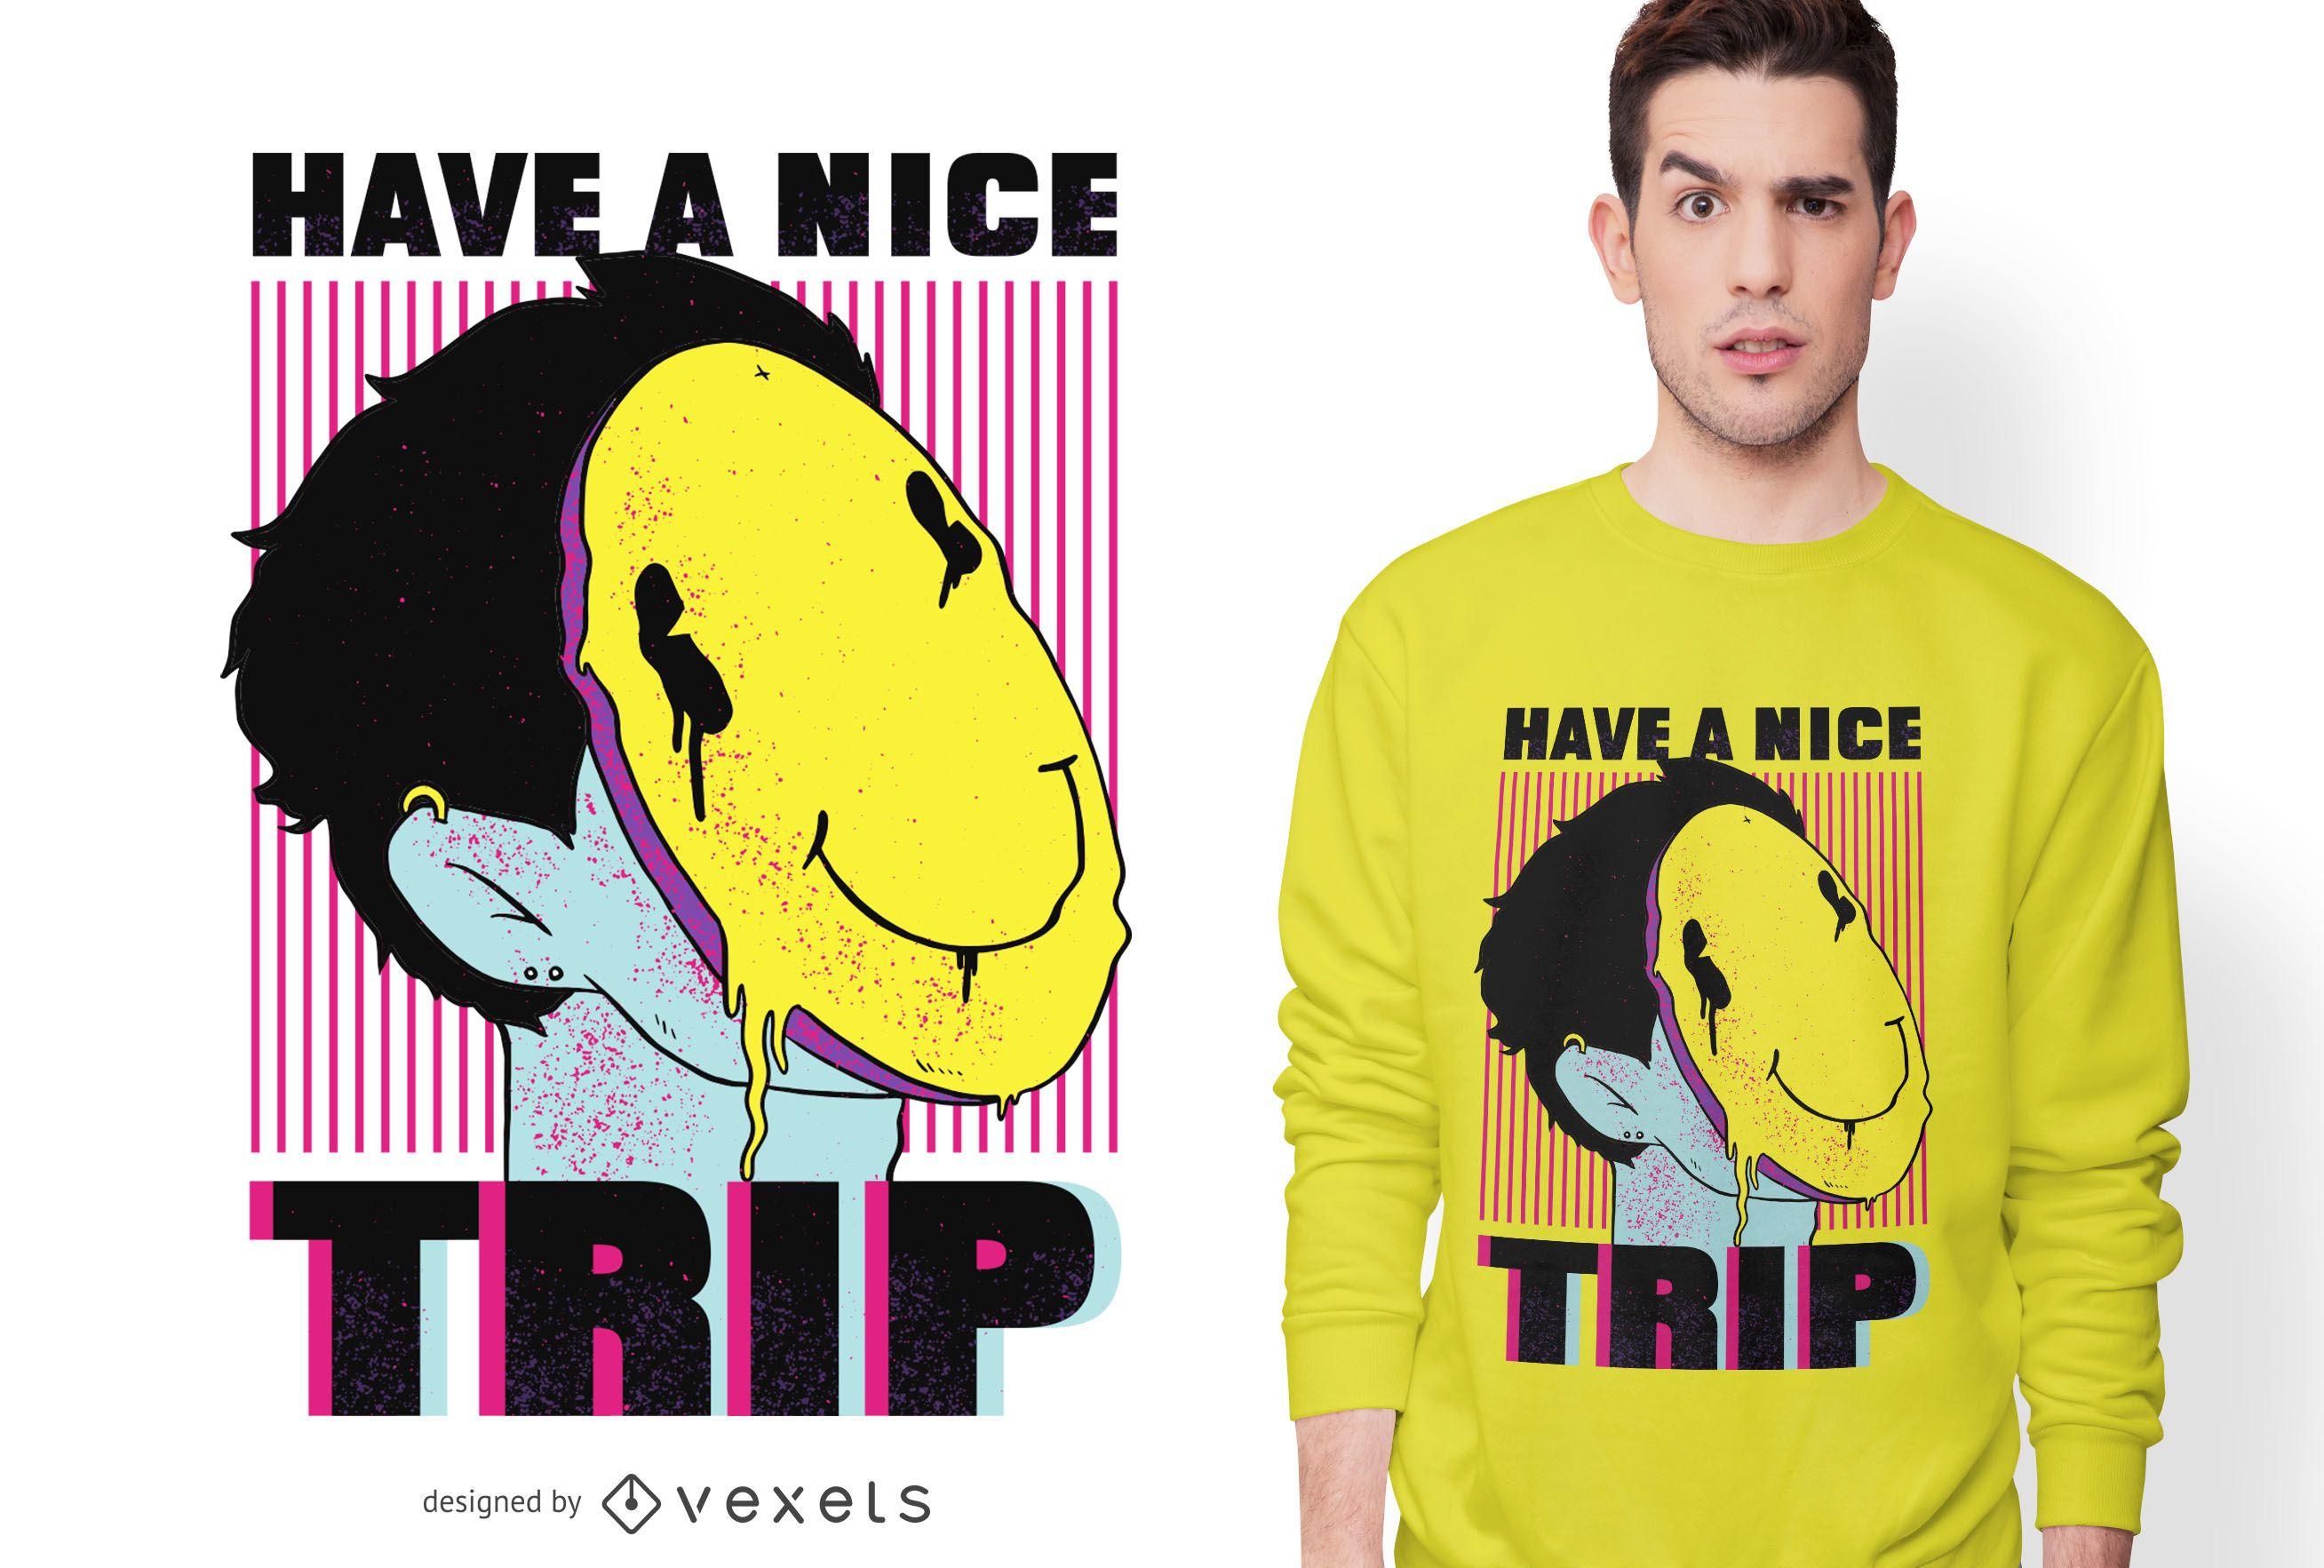 Acid Trip Text T-shirt Design